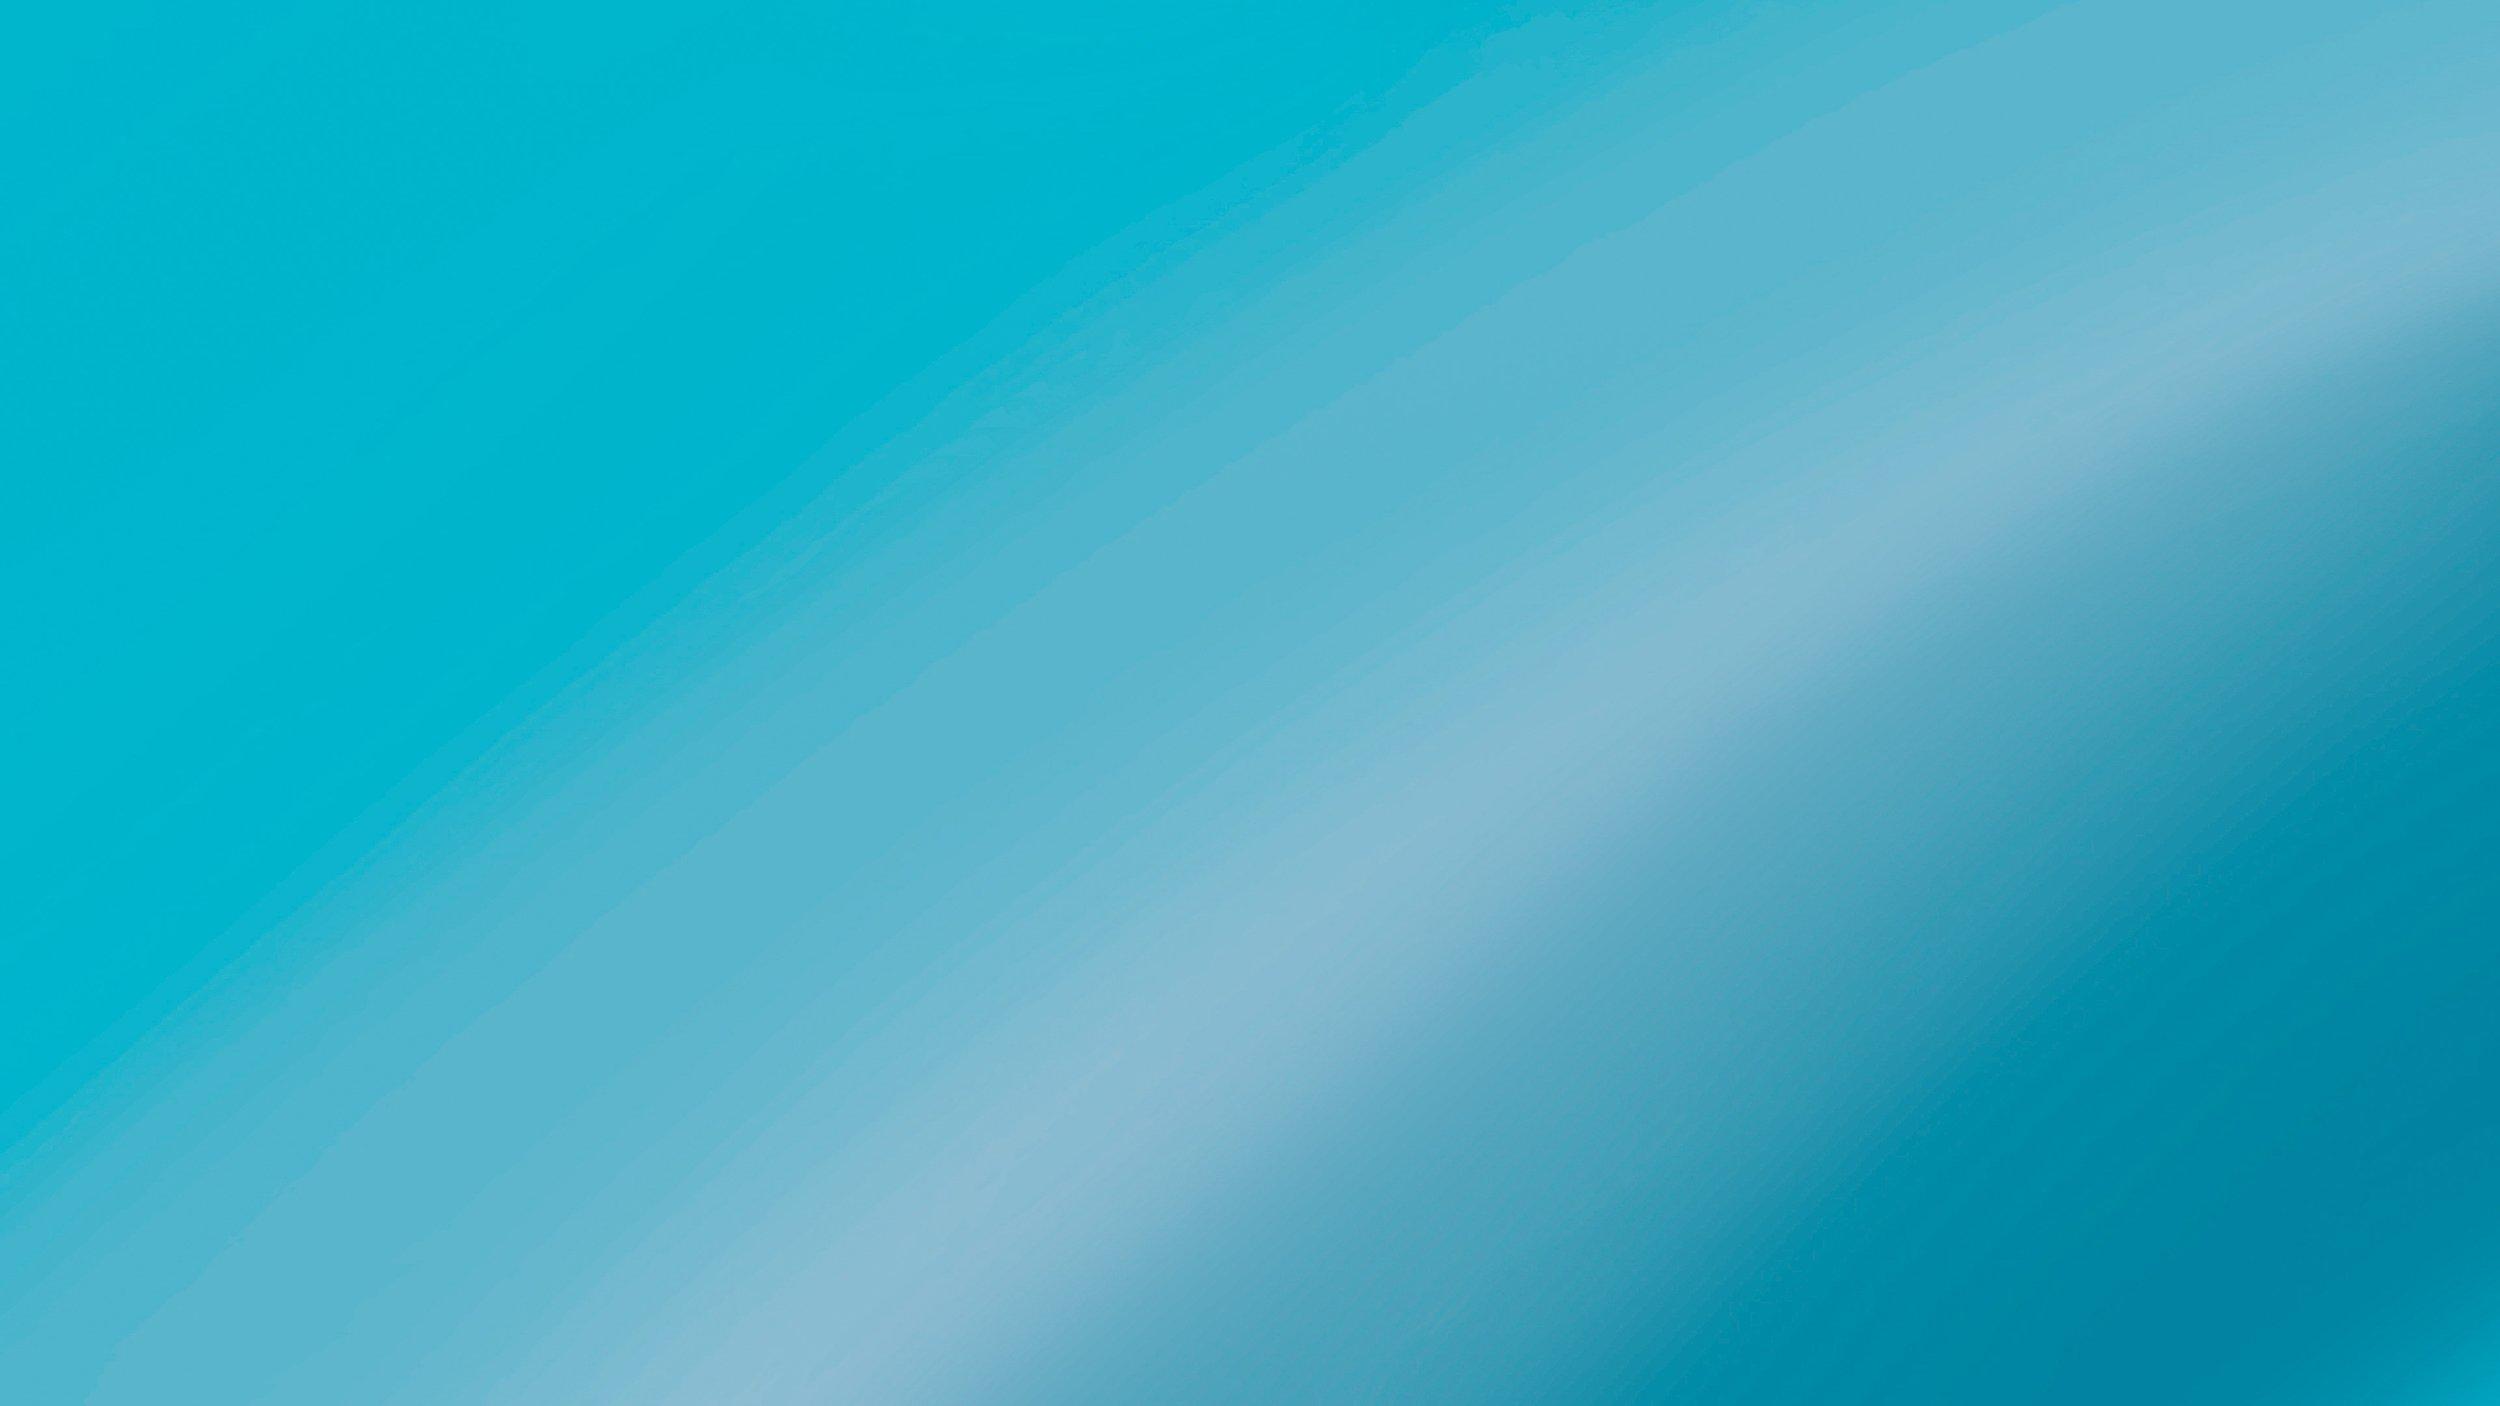 Minimal-Wallpaper-Gradient-for-Mac-Daniel-Romero-rmrdnl-5.jpg